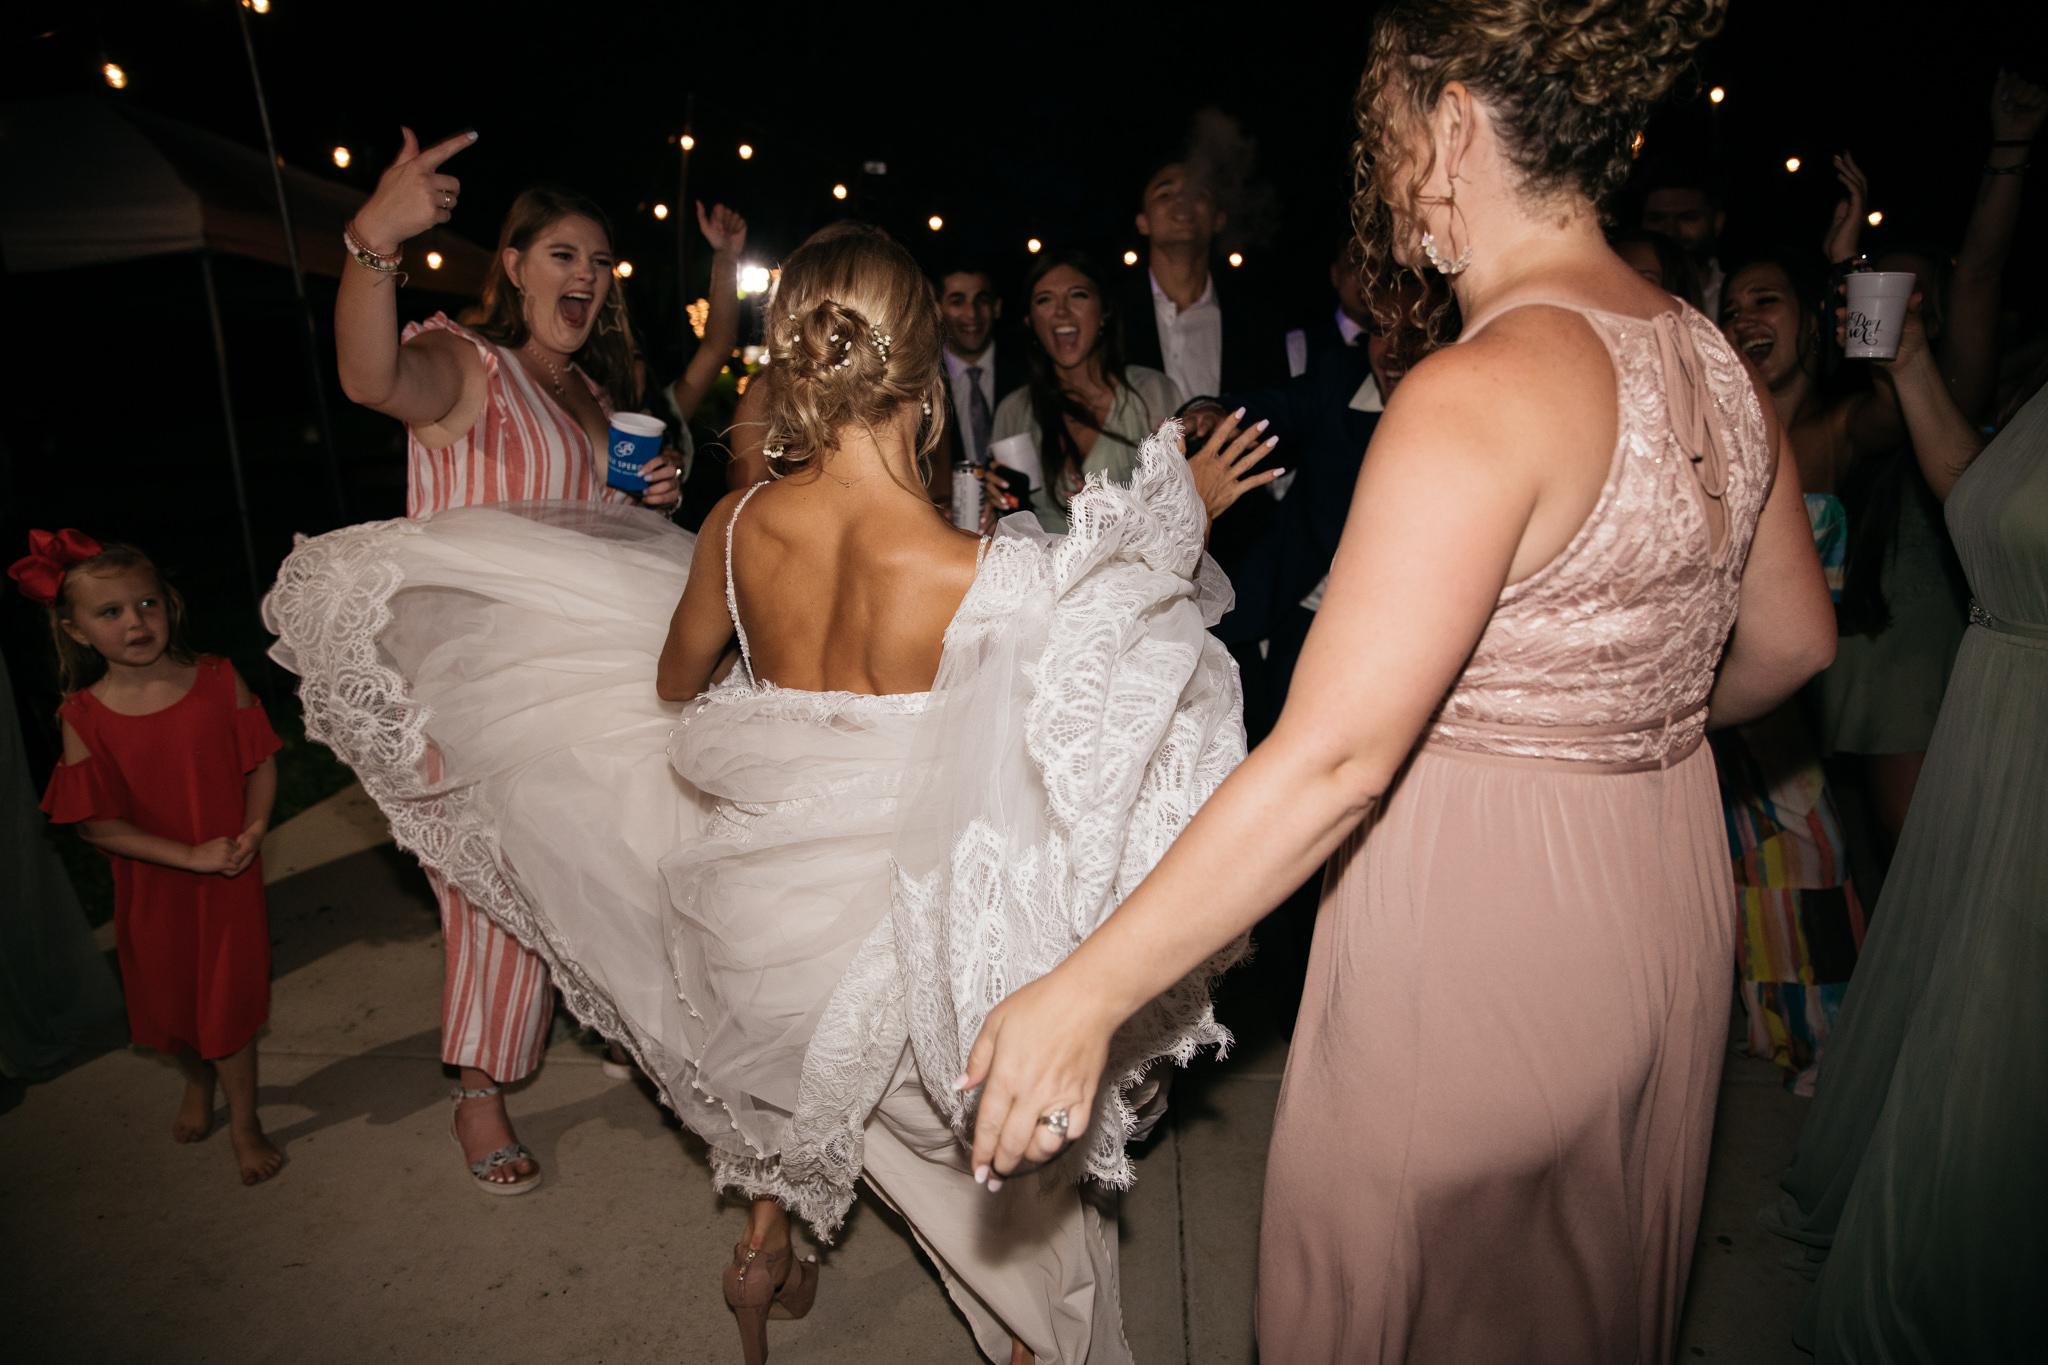 backyard-wedding-thewarmtharoundyou-lexy-branson-84.jpg